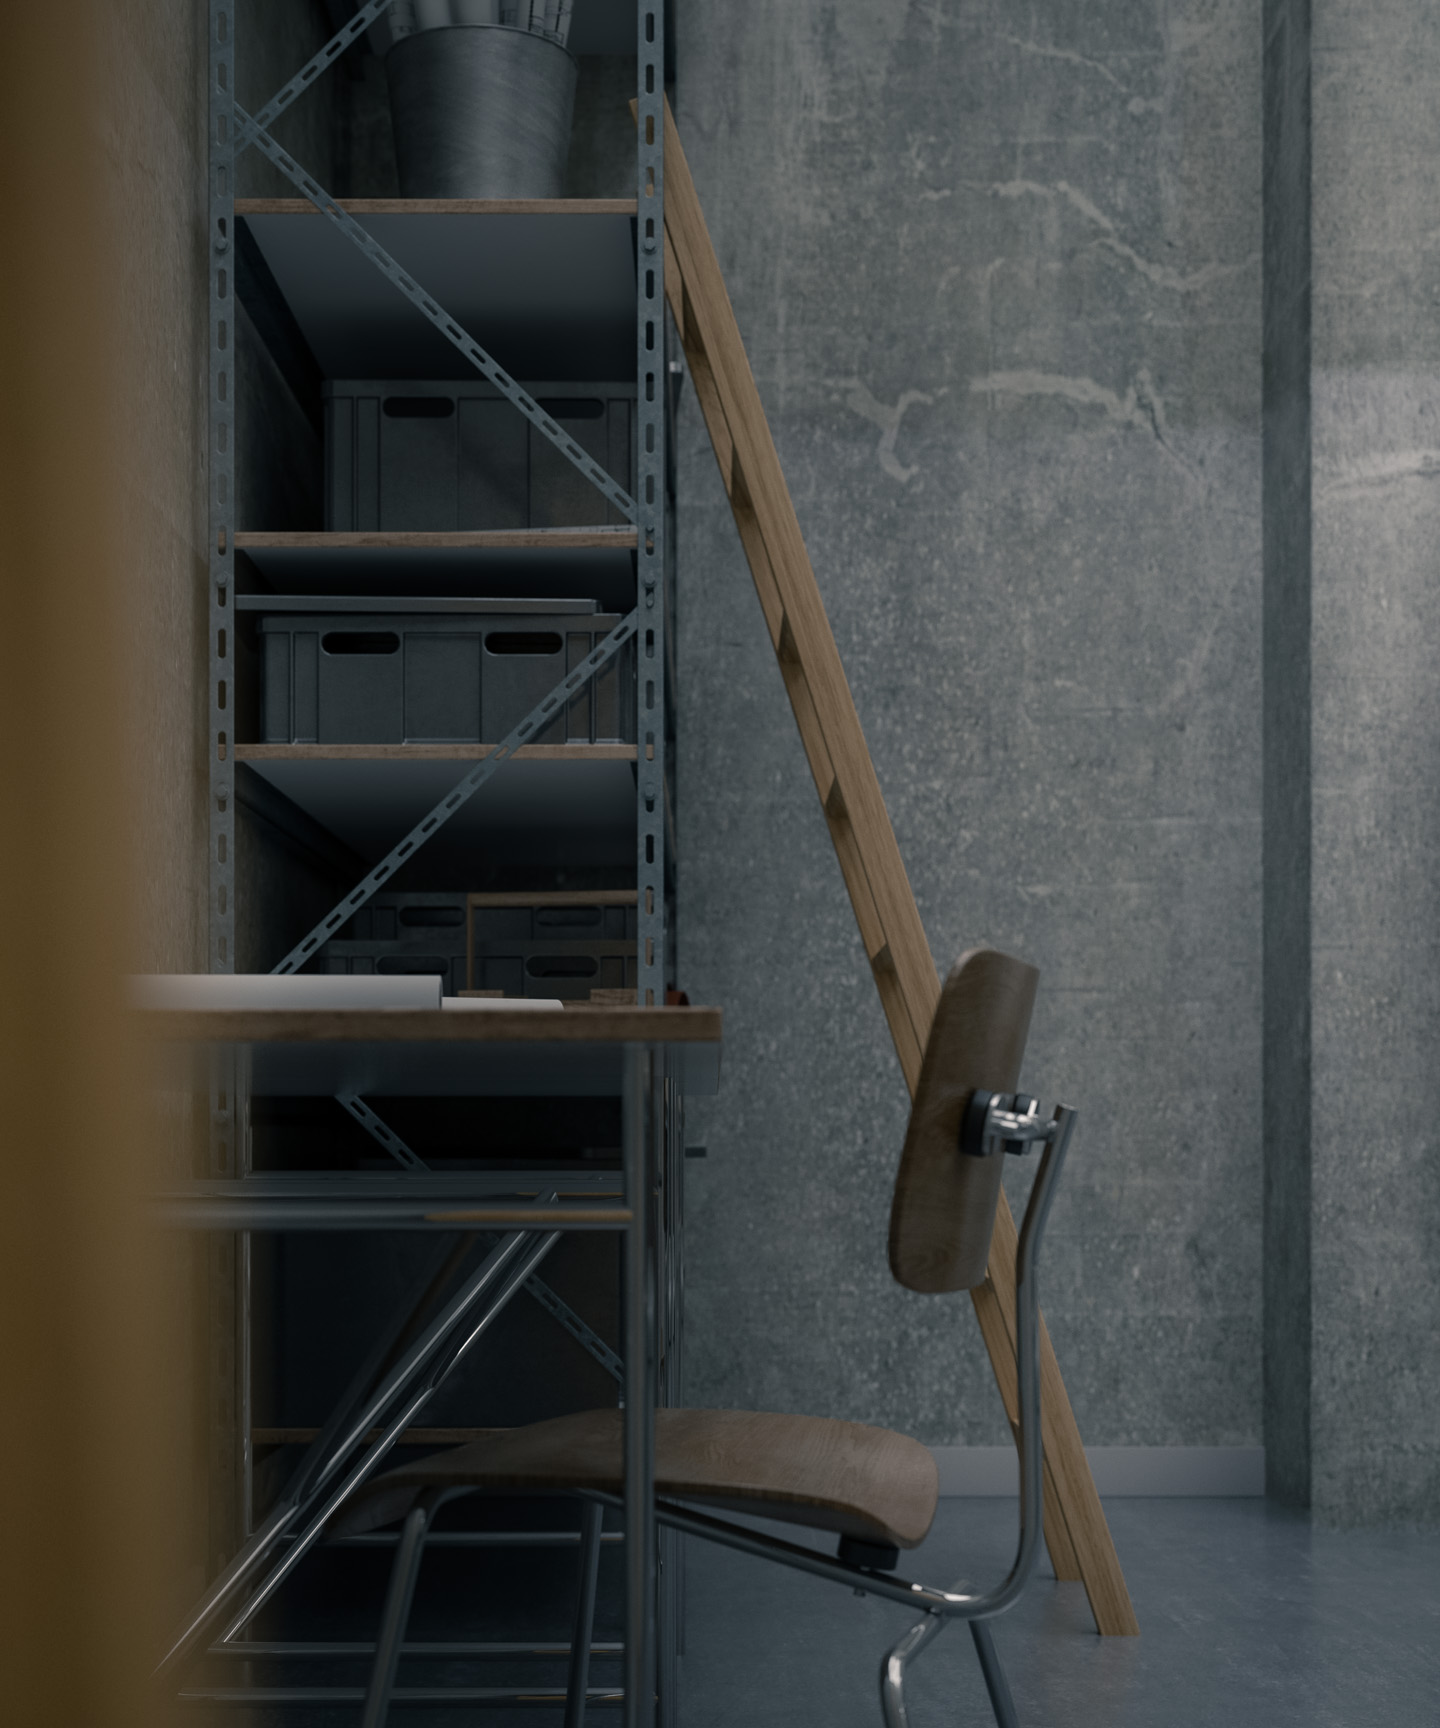 concrete walls 007 CGI